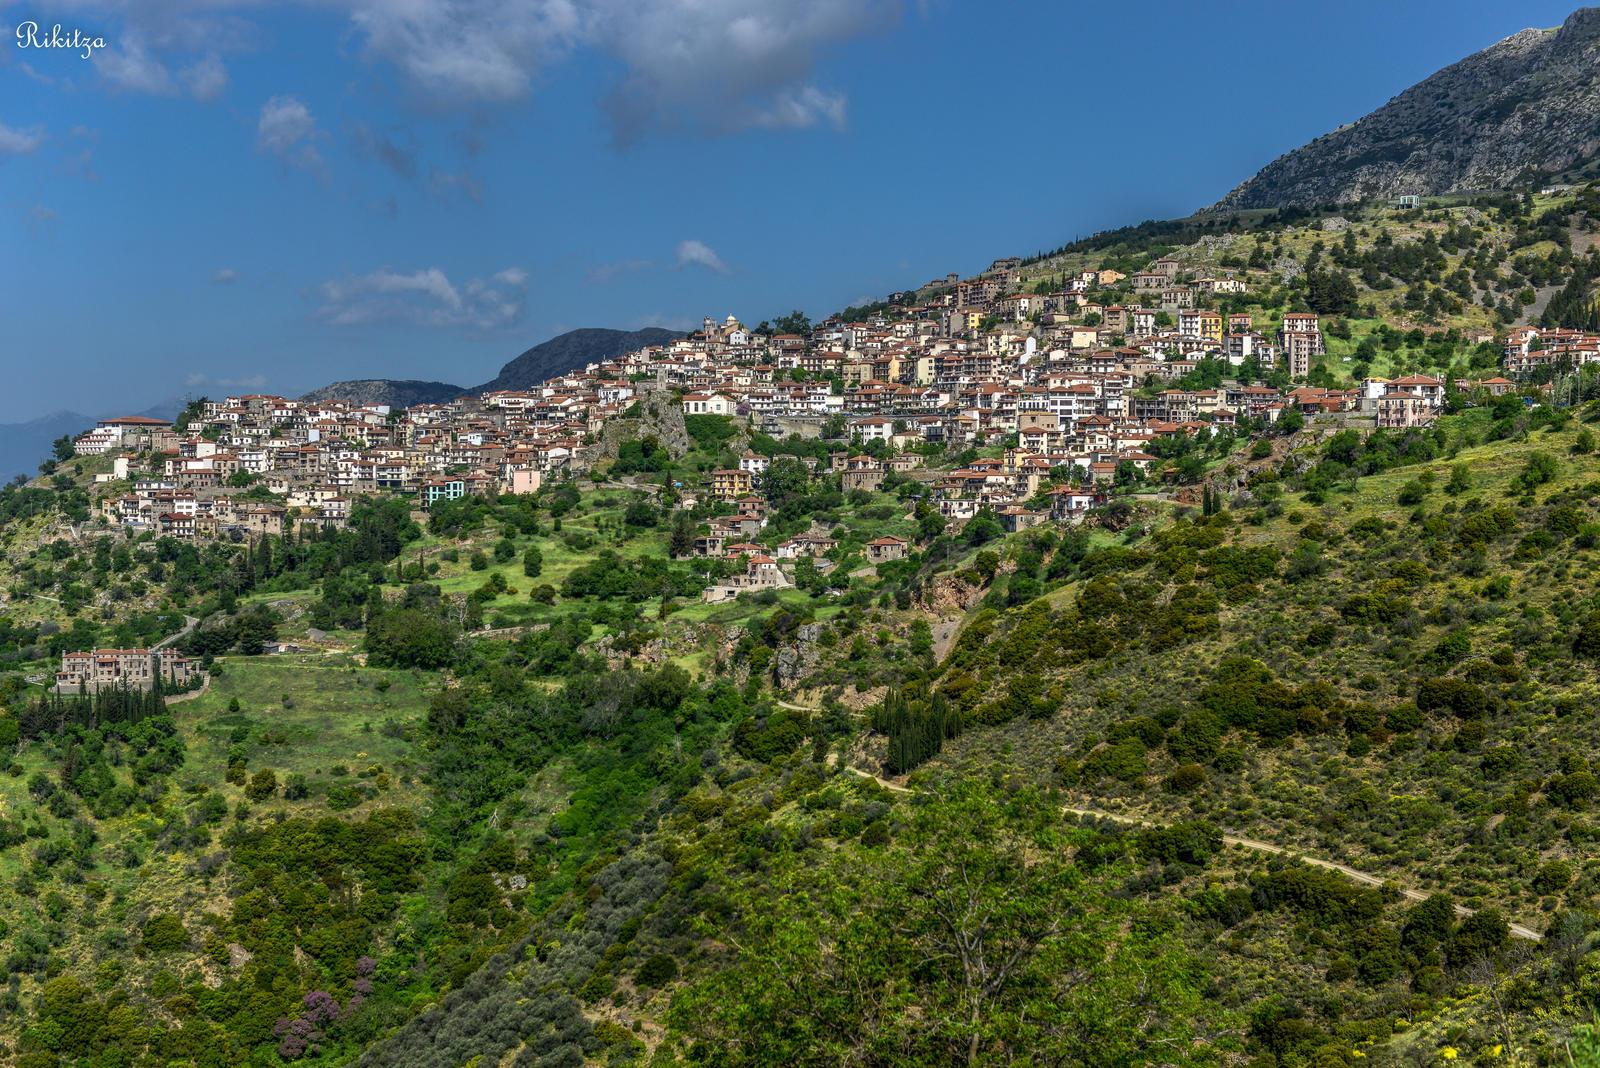 Delphi Greece  city photos : Arachova Delphi GREECE by Rikitza on DeviantArt